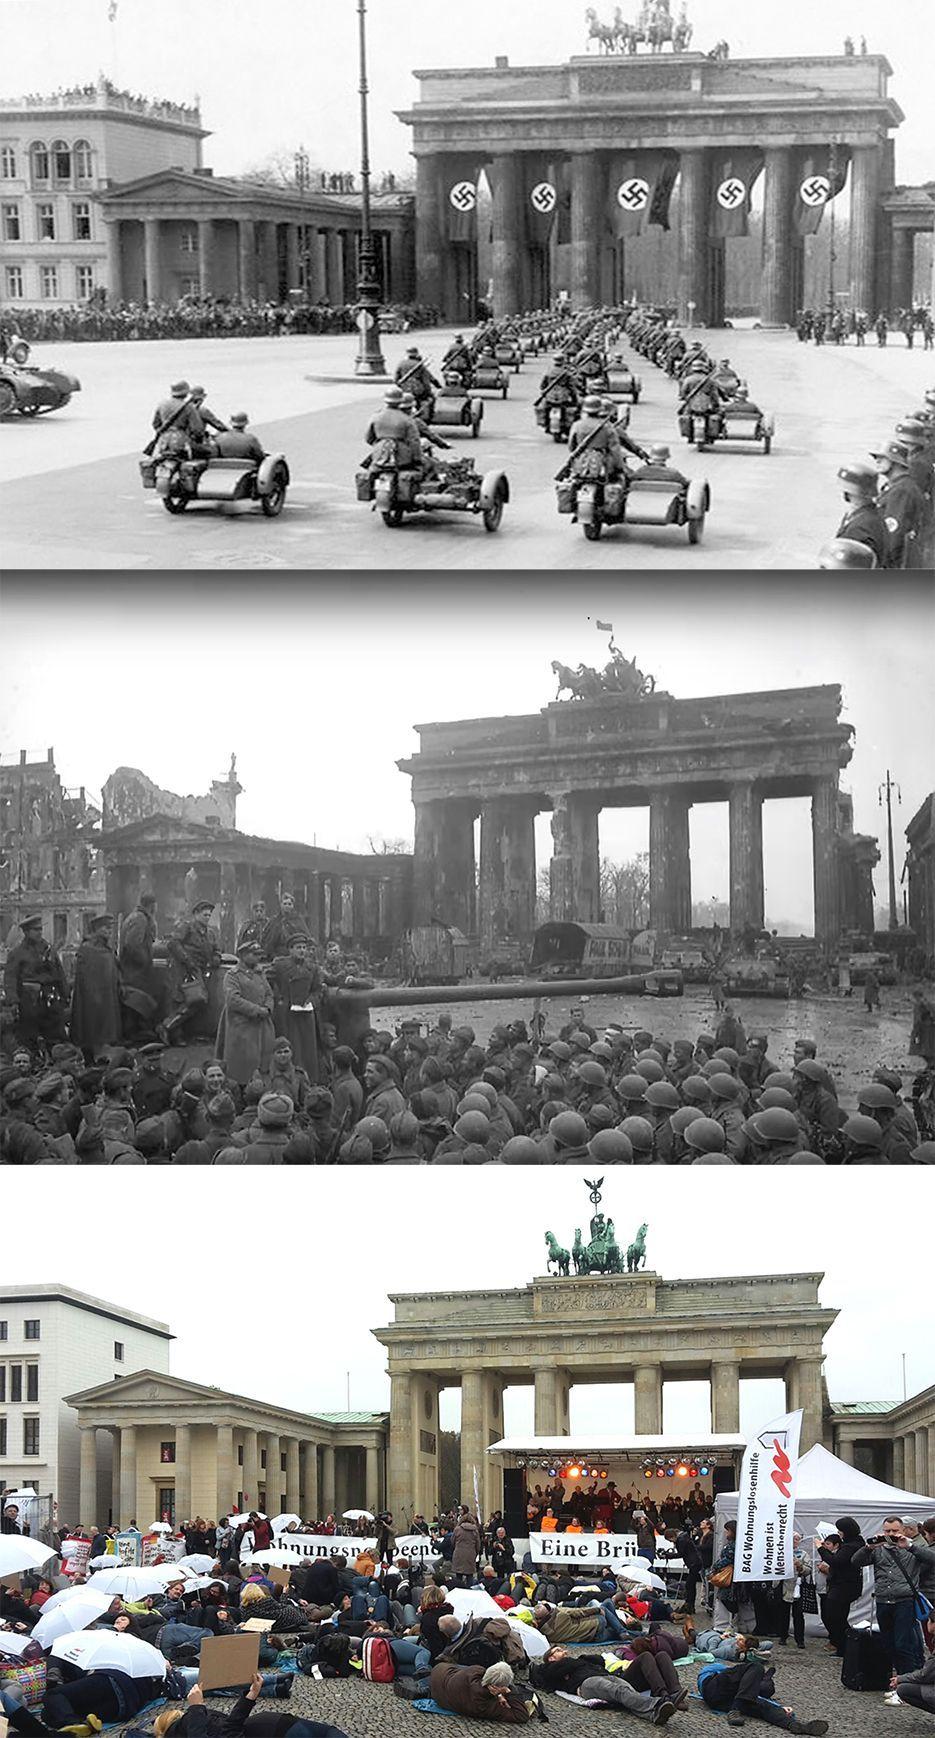 Torbrandenburg Brandenburger Gatebrandenburger Tor Brandenburg Gate Dunya Tarihi Askeri Tarih Brandenburg